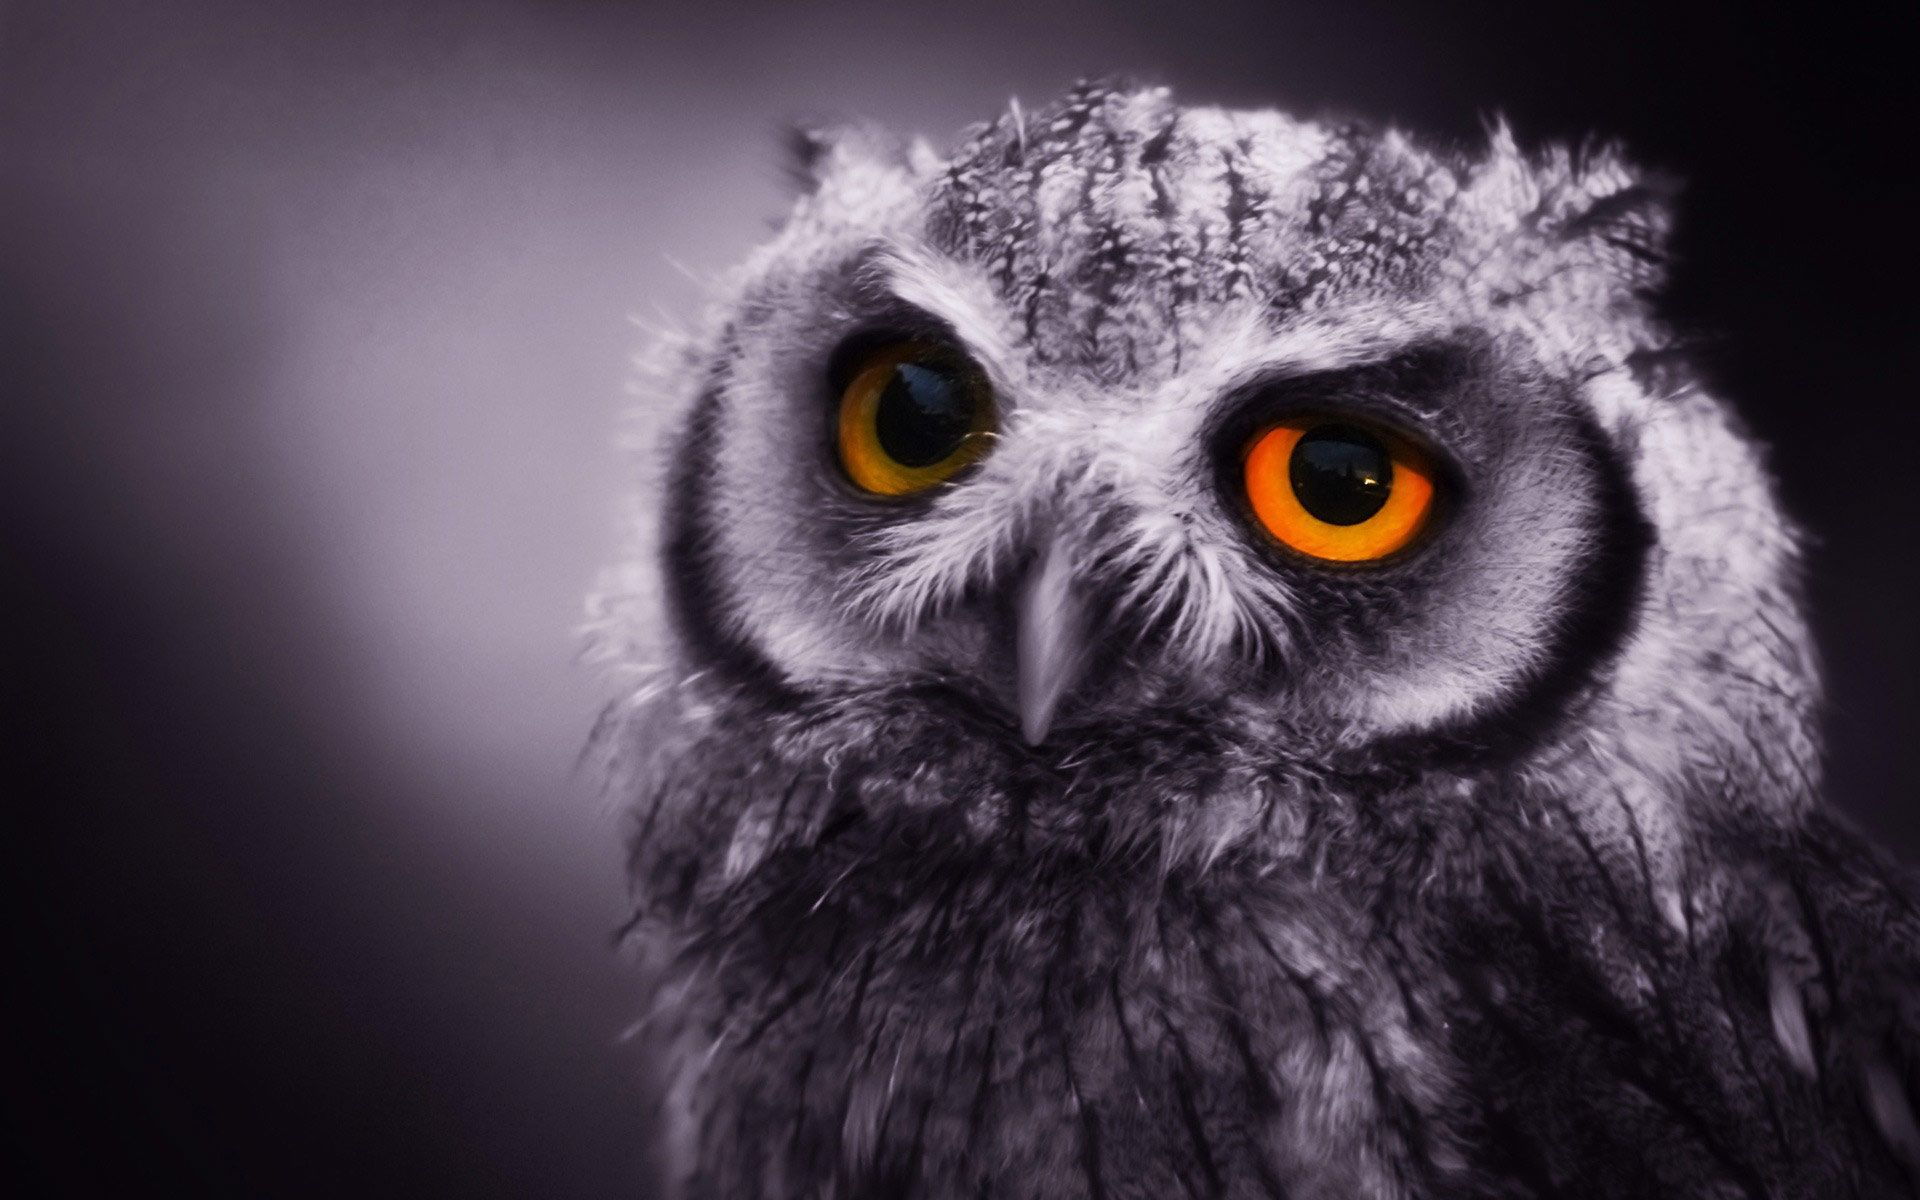 Dark Owl Wallpapers PixelsTalk Cute Wallpaper HD 1920x1200